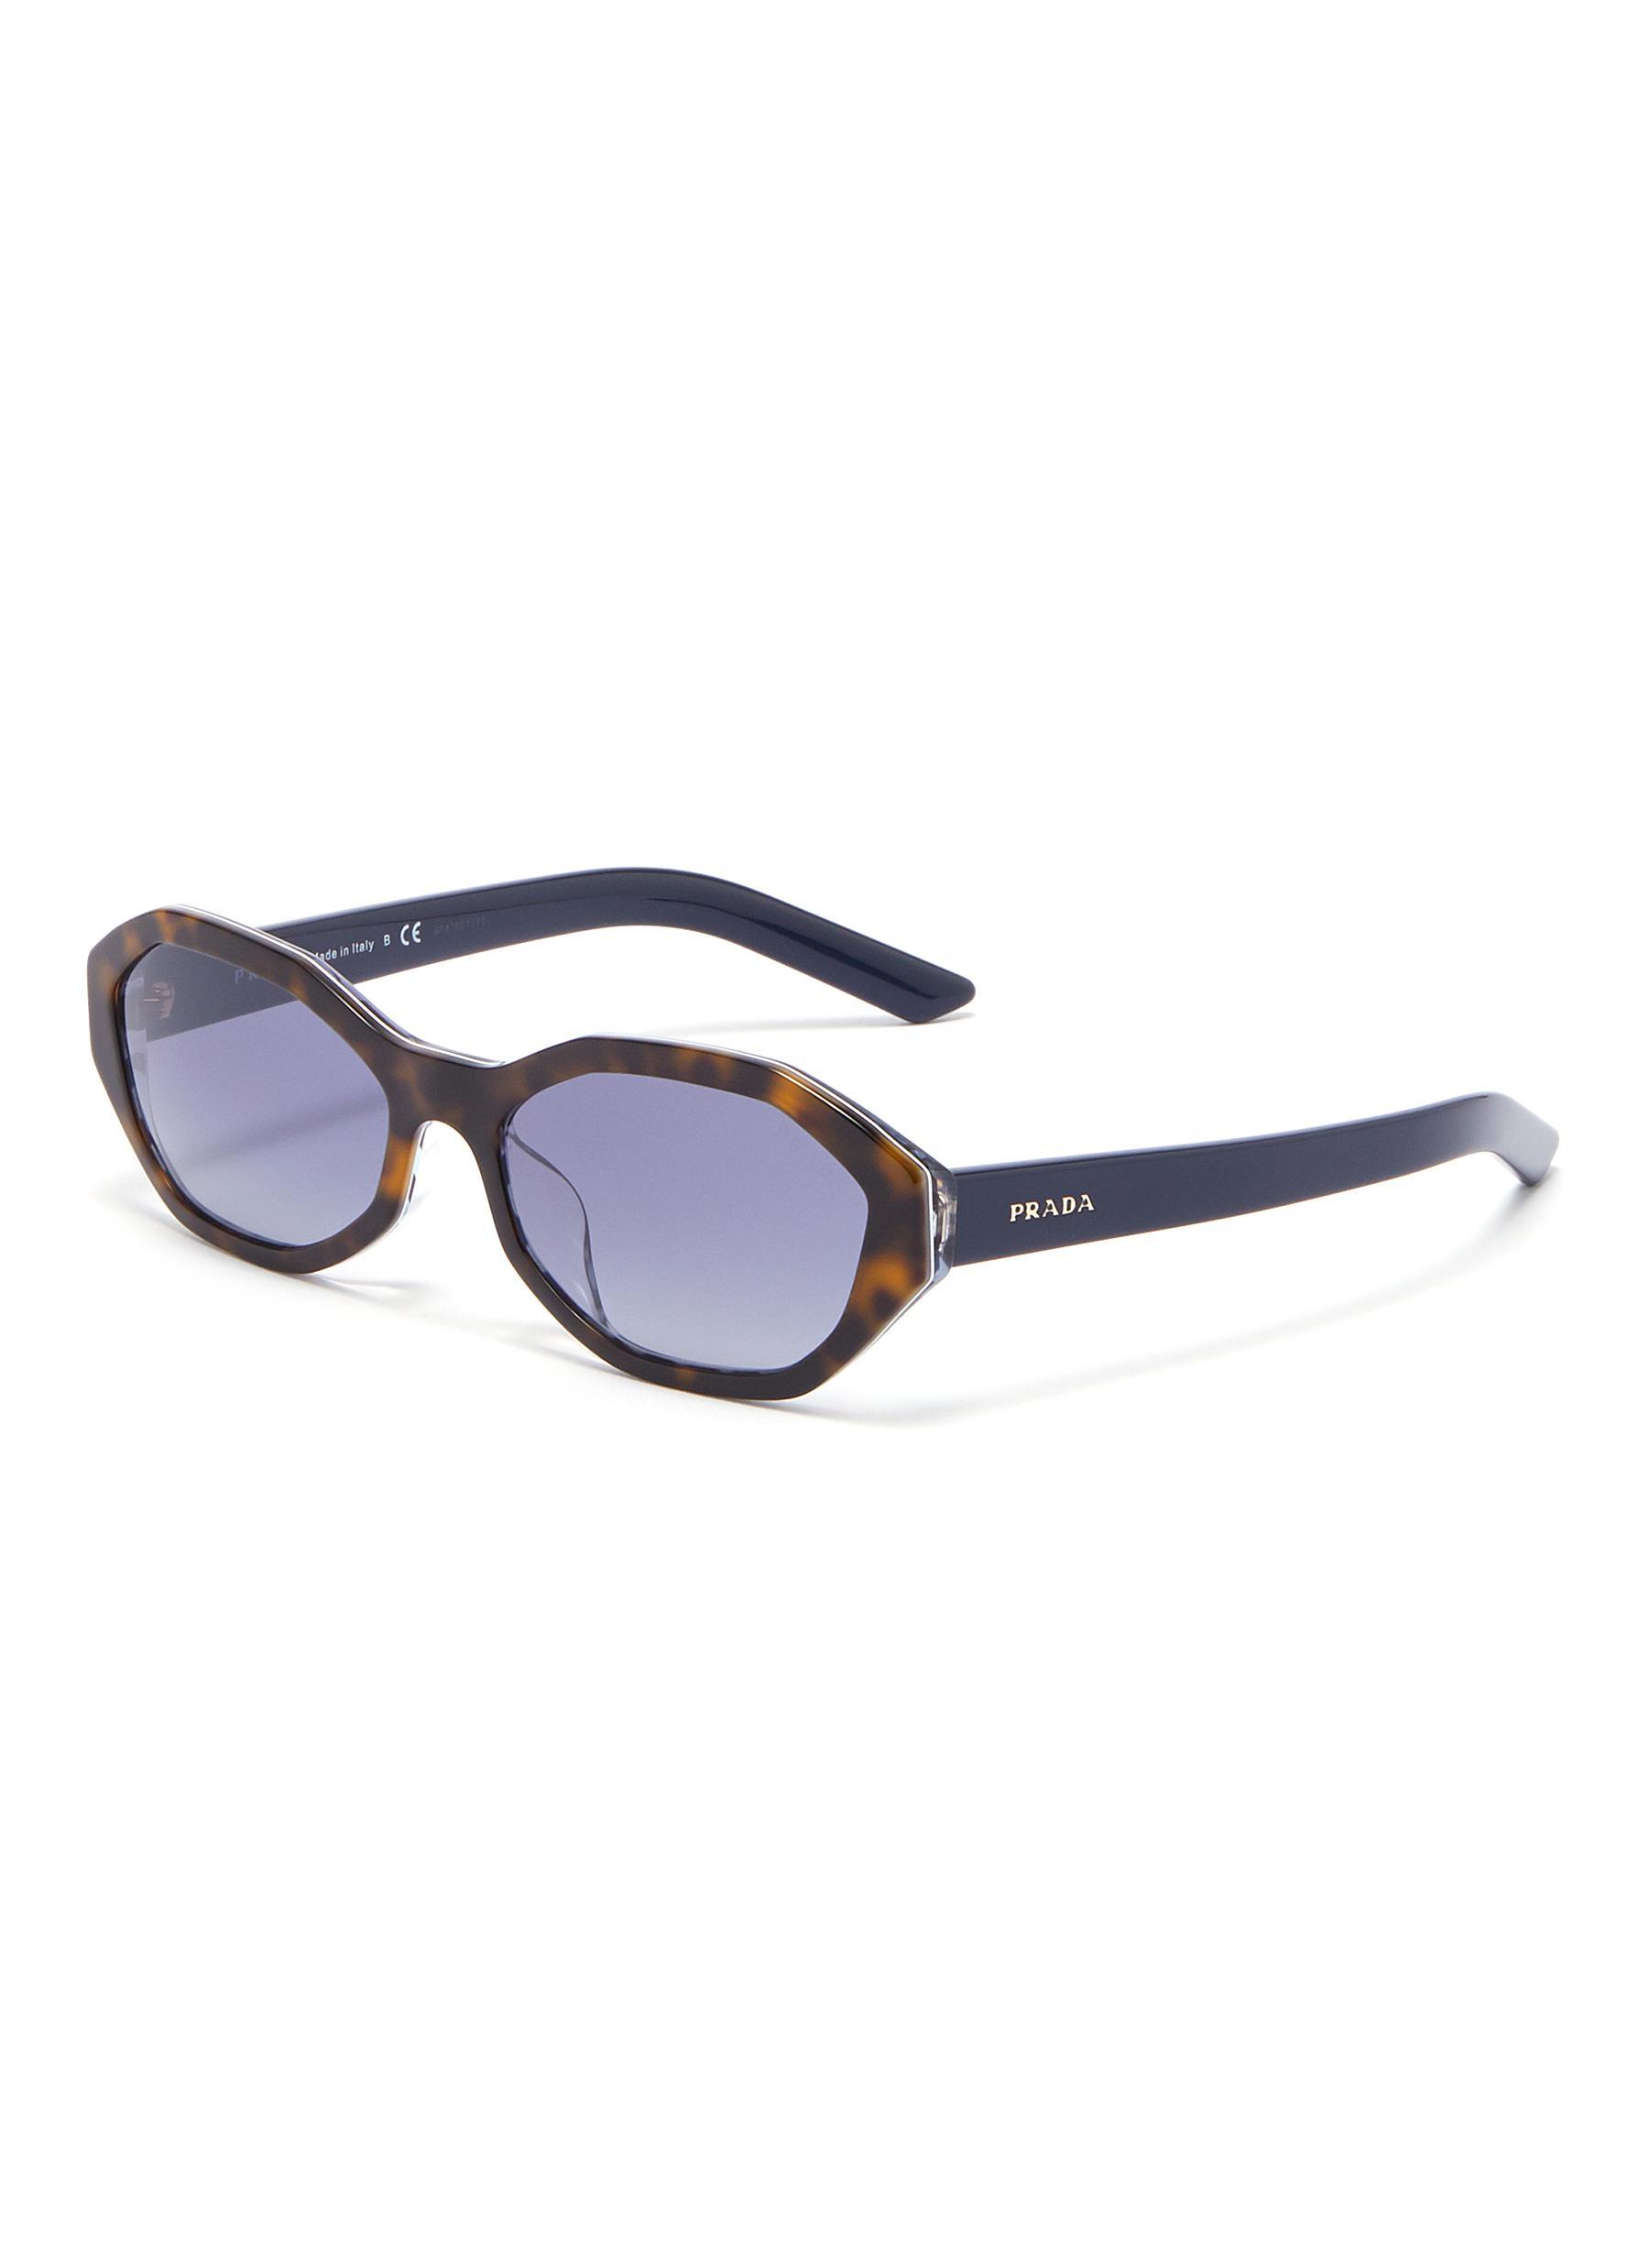 071405ea2998 Main View - Click To Enlarge - PRADA - Tortoiseshell effect rim acetate  oval sunglasses